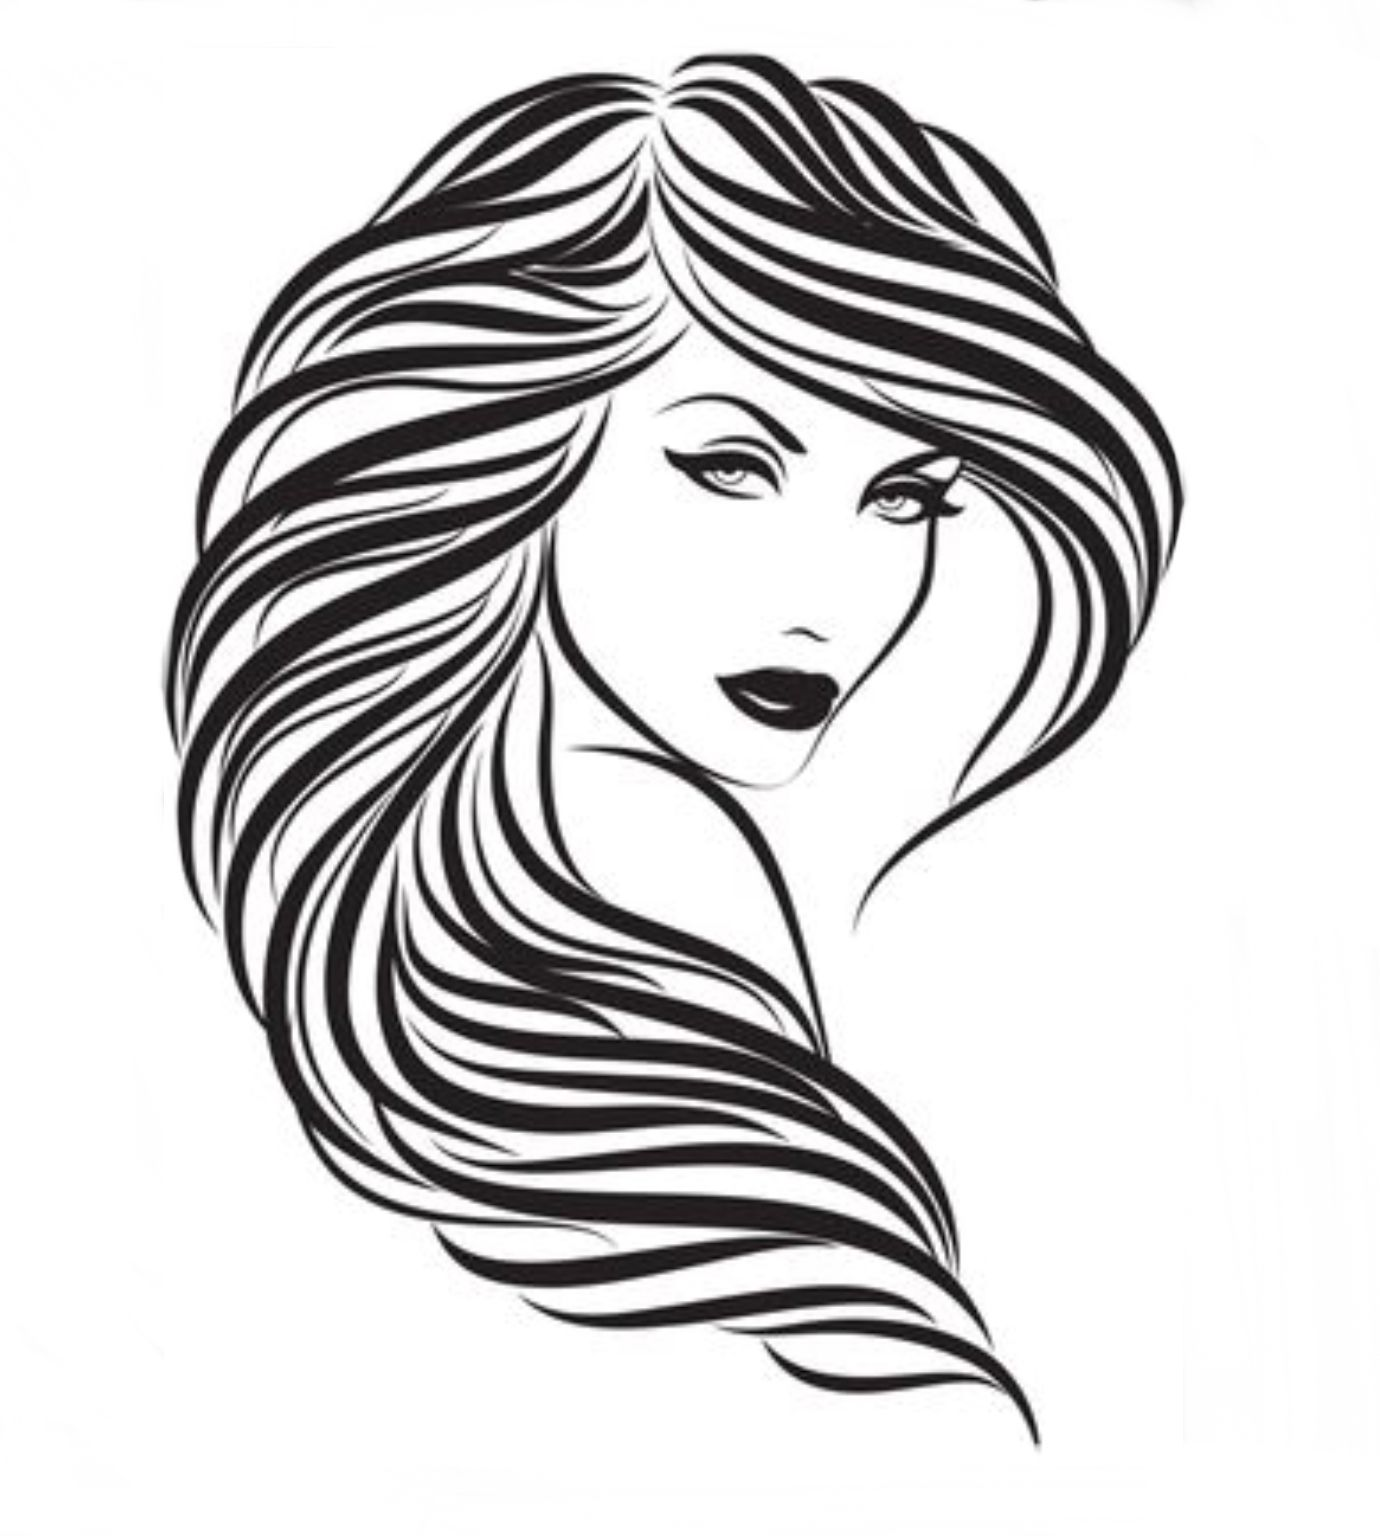 Pin by Гасанова Екатерина Александровна on Идеи для волос